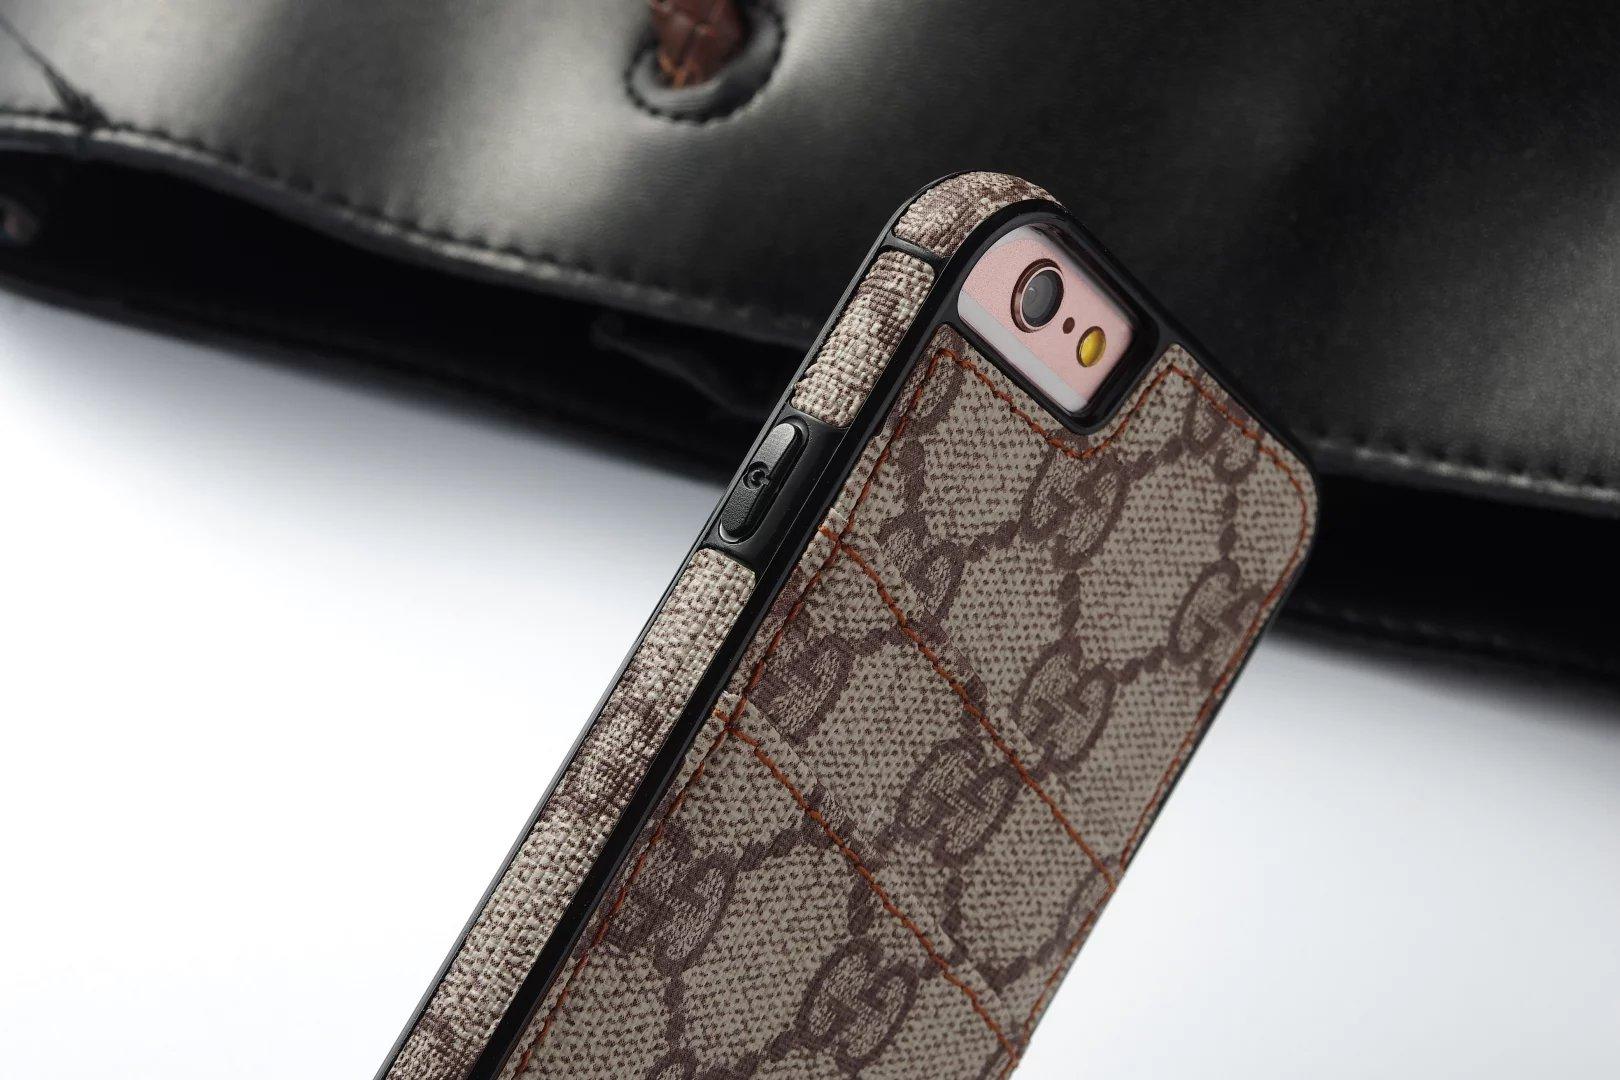 filzhülle iphone schöne iphone hüllen Louis Vuitton iphone 8 hüllen handy tasche iphone 8 designer handyhüllen handy ca8 bedrucken foto cover handy tpu hülle iphone 8 schutzhülle gestalten